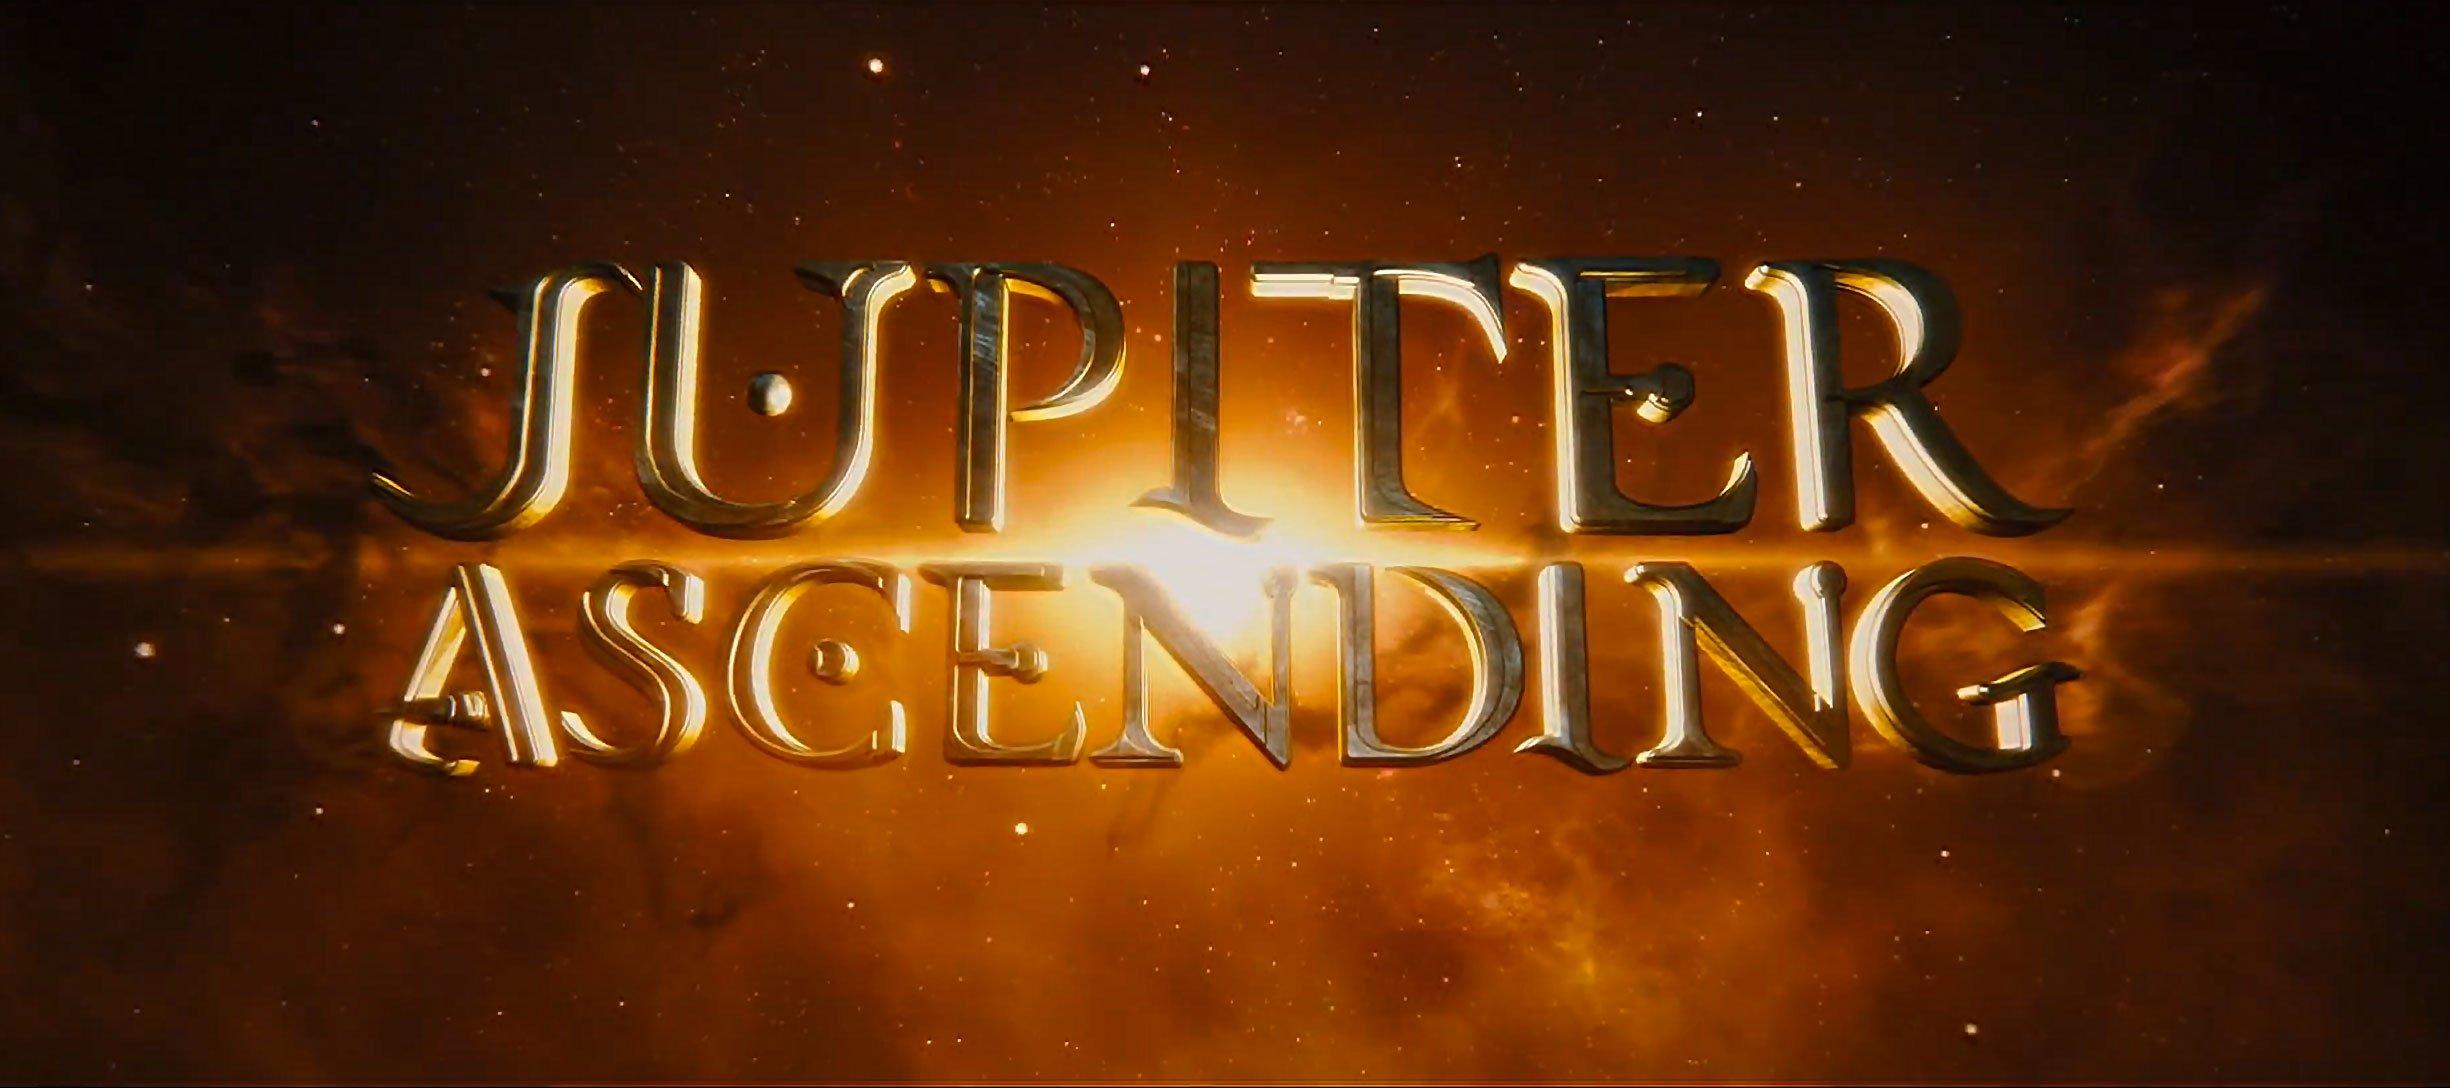 Jupiter Ascending Retina Movie Wallpaper: JUPITER ASCENDING Action Adventure Sci-fi Movie Film (43